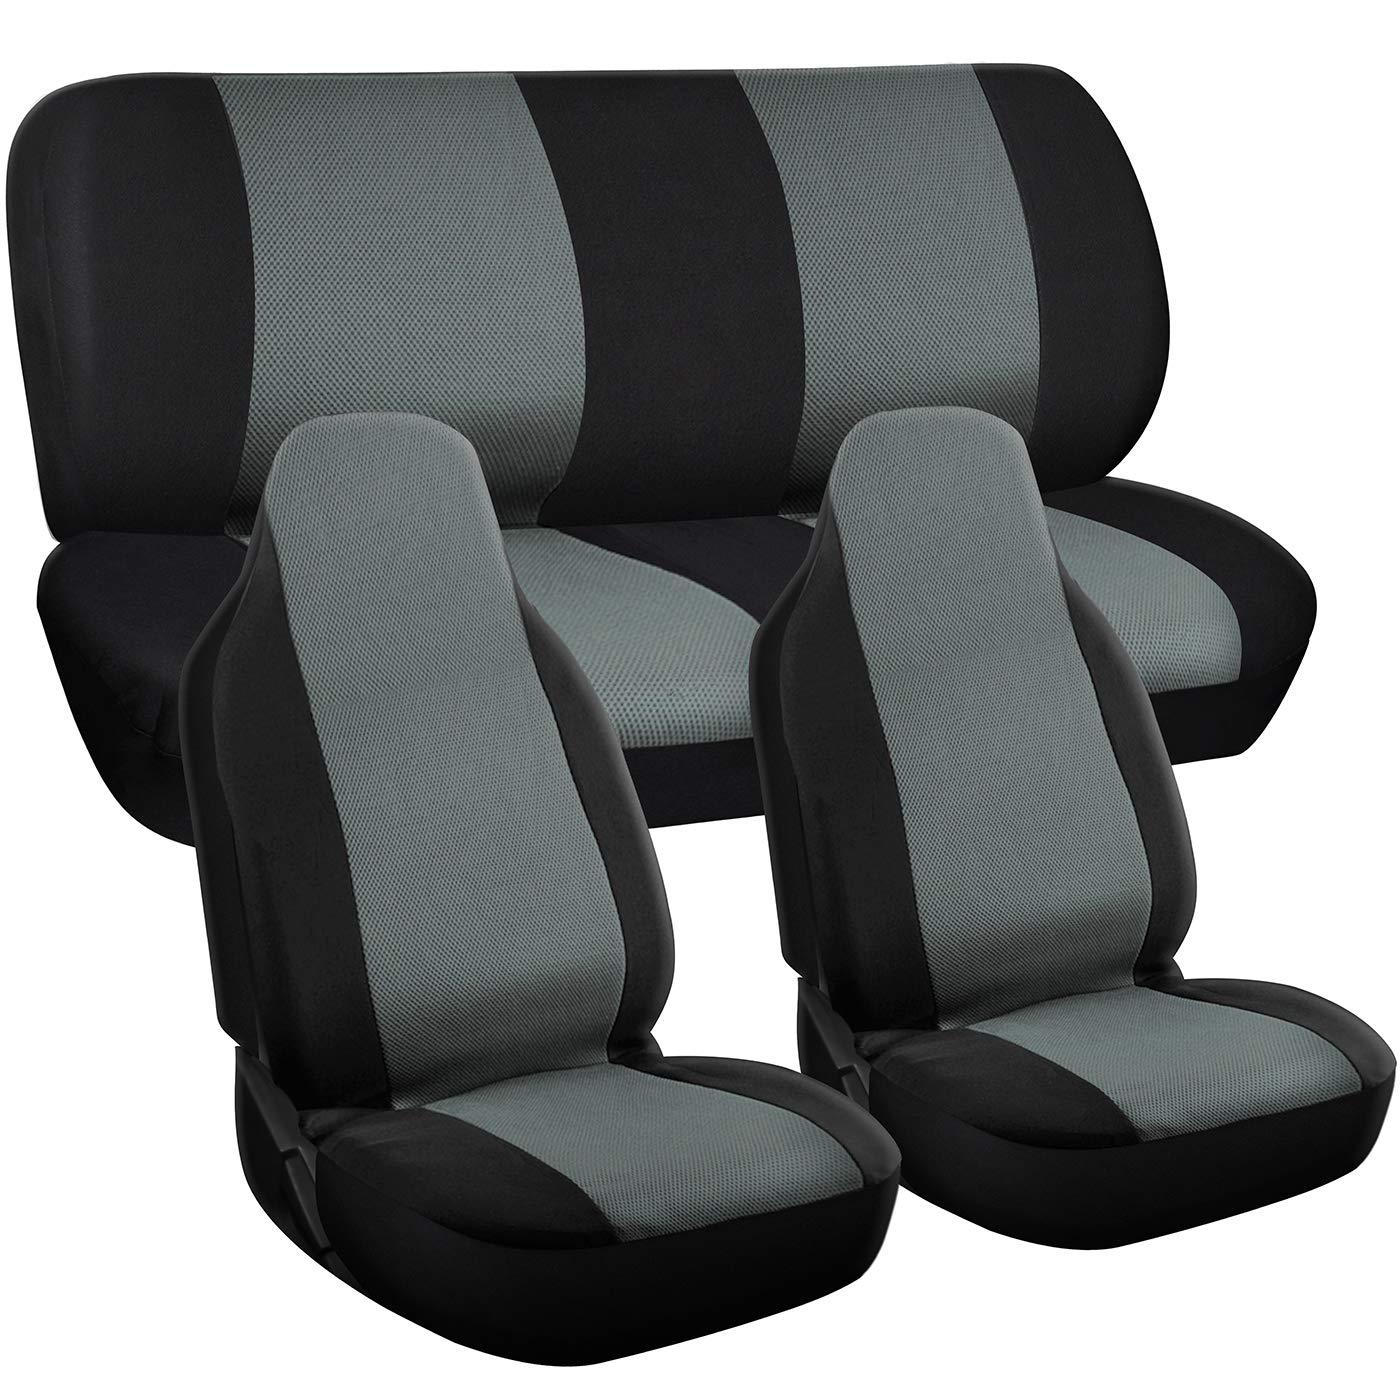 Motorup America Auto Seat Cover Full Set - Fits Select Vehicles Car Truck Van SUV - Gray and Black MUA-SCMS17GYBK-HS-NEW